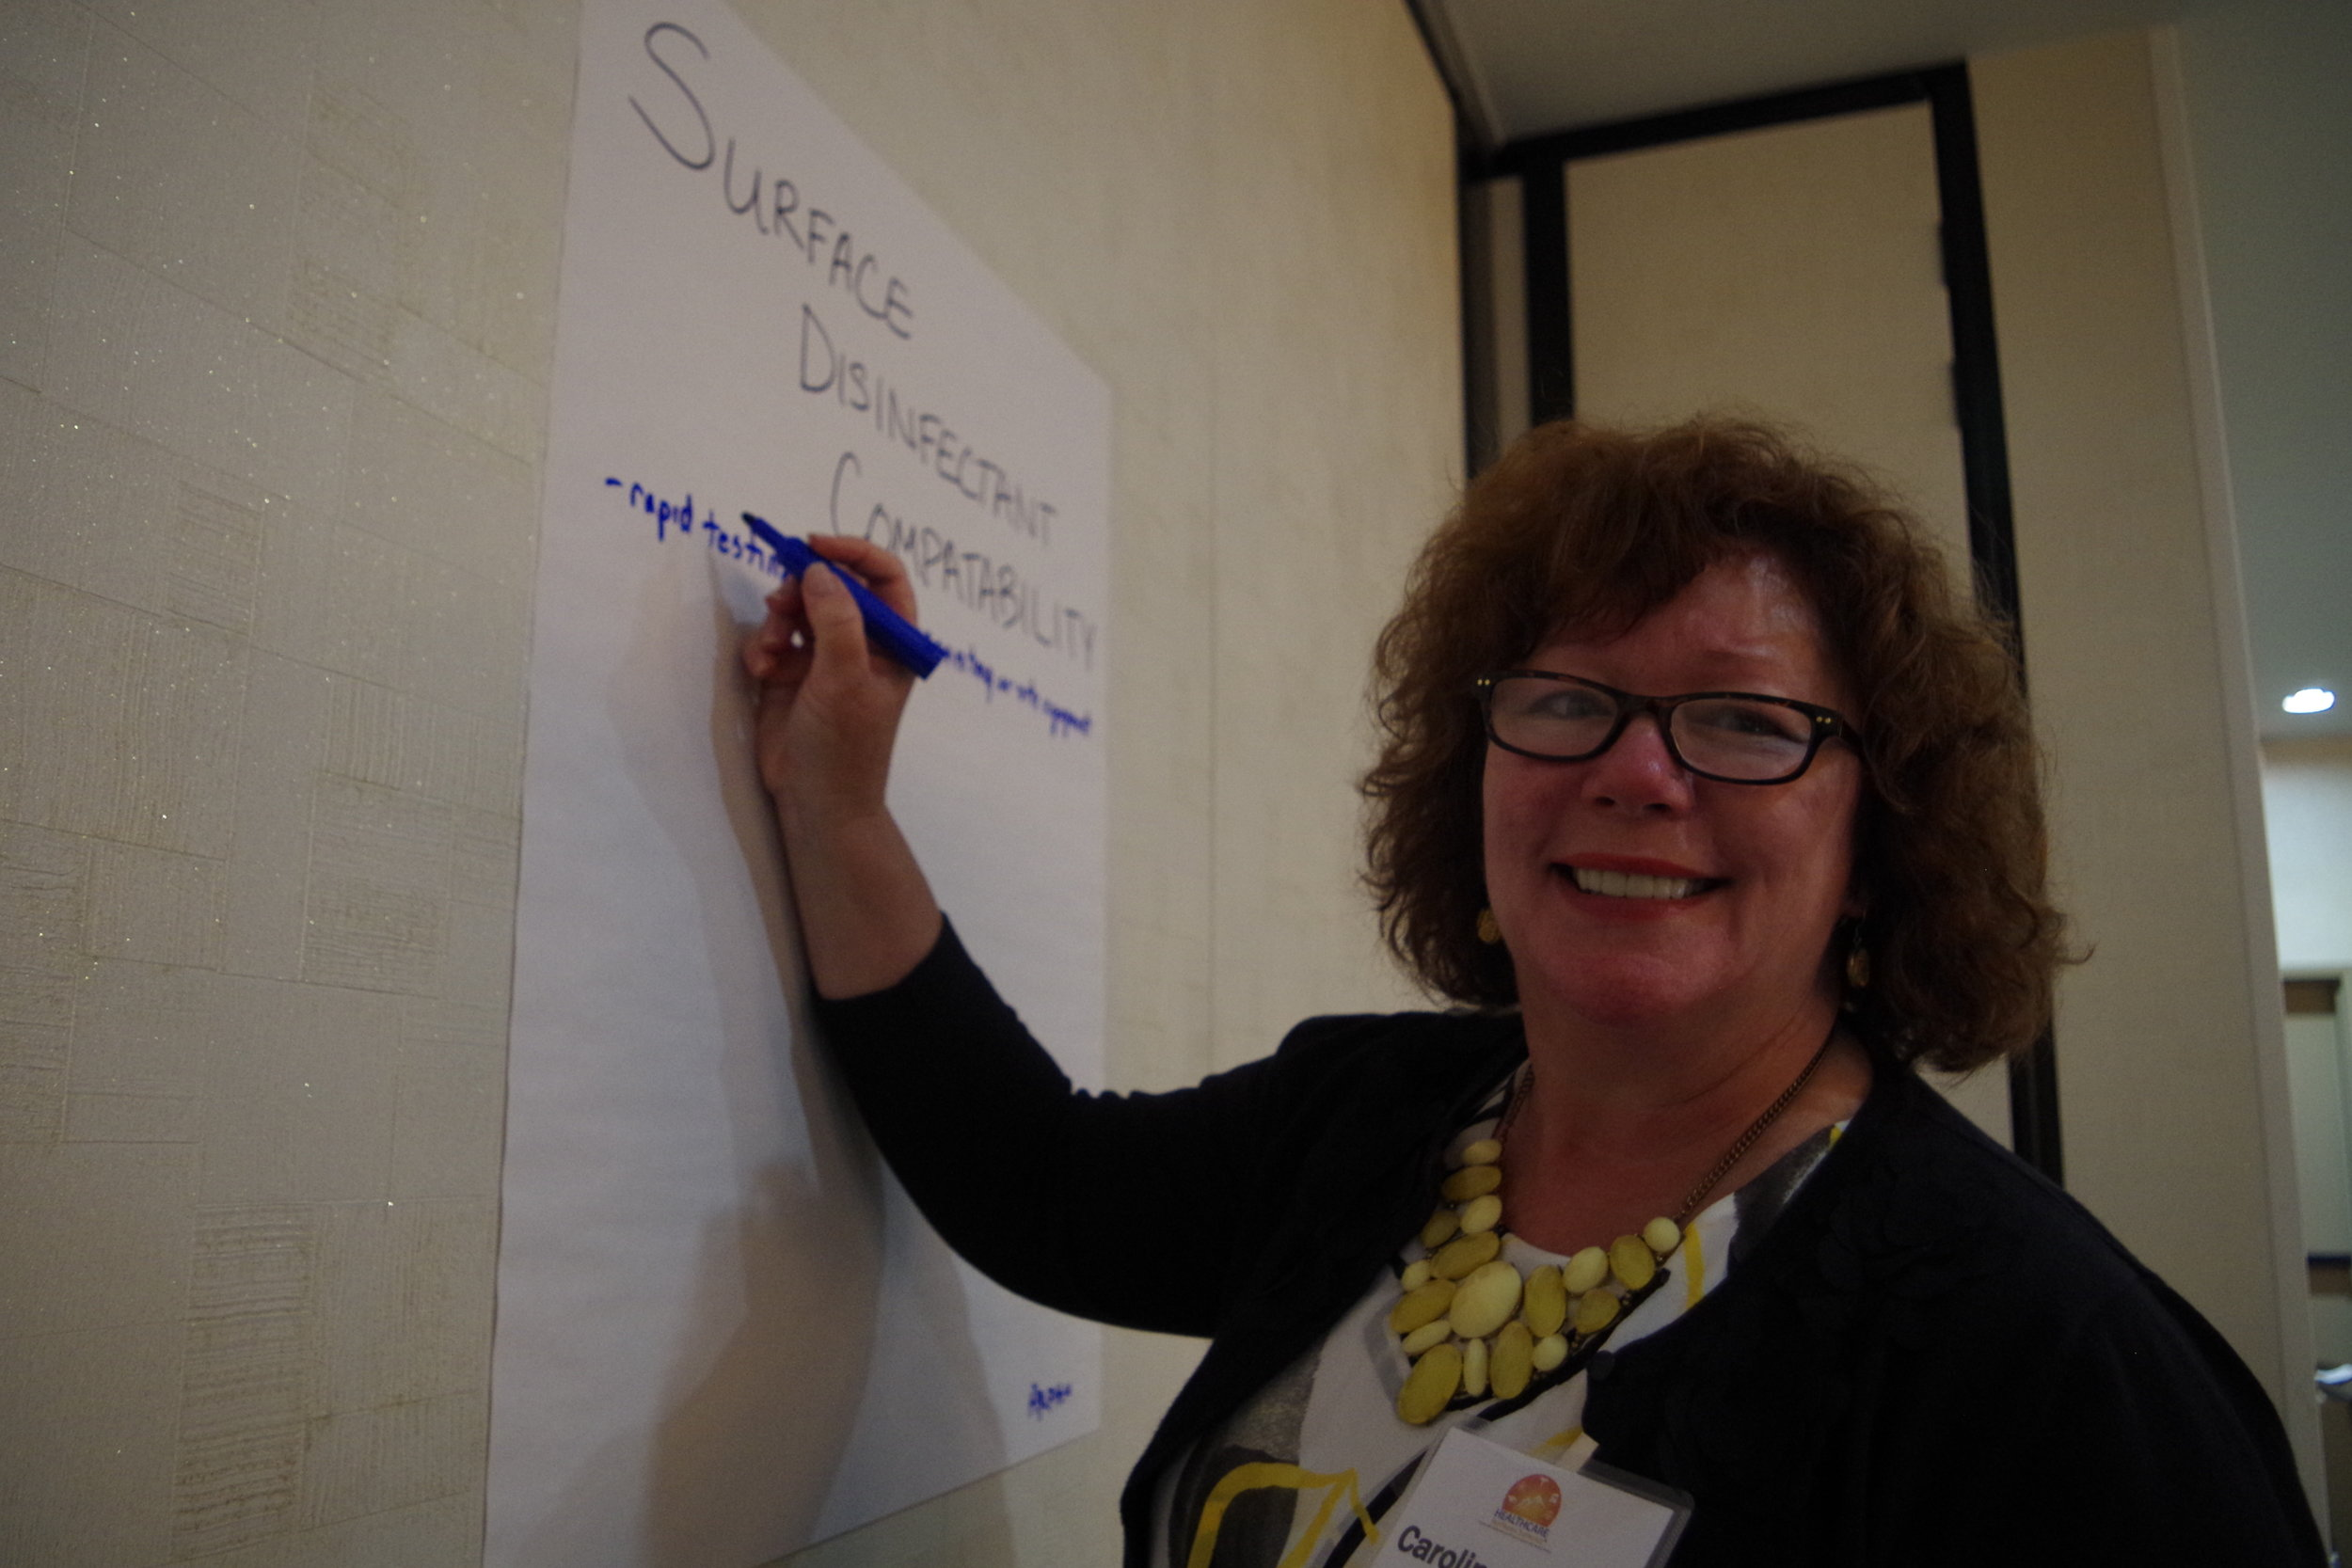 Caroline Etland during initiative group brainstorming